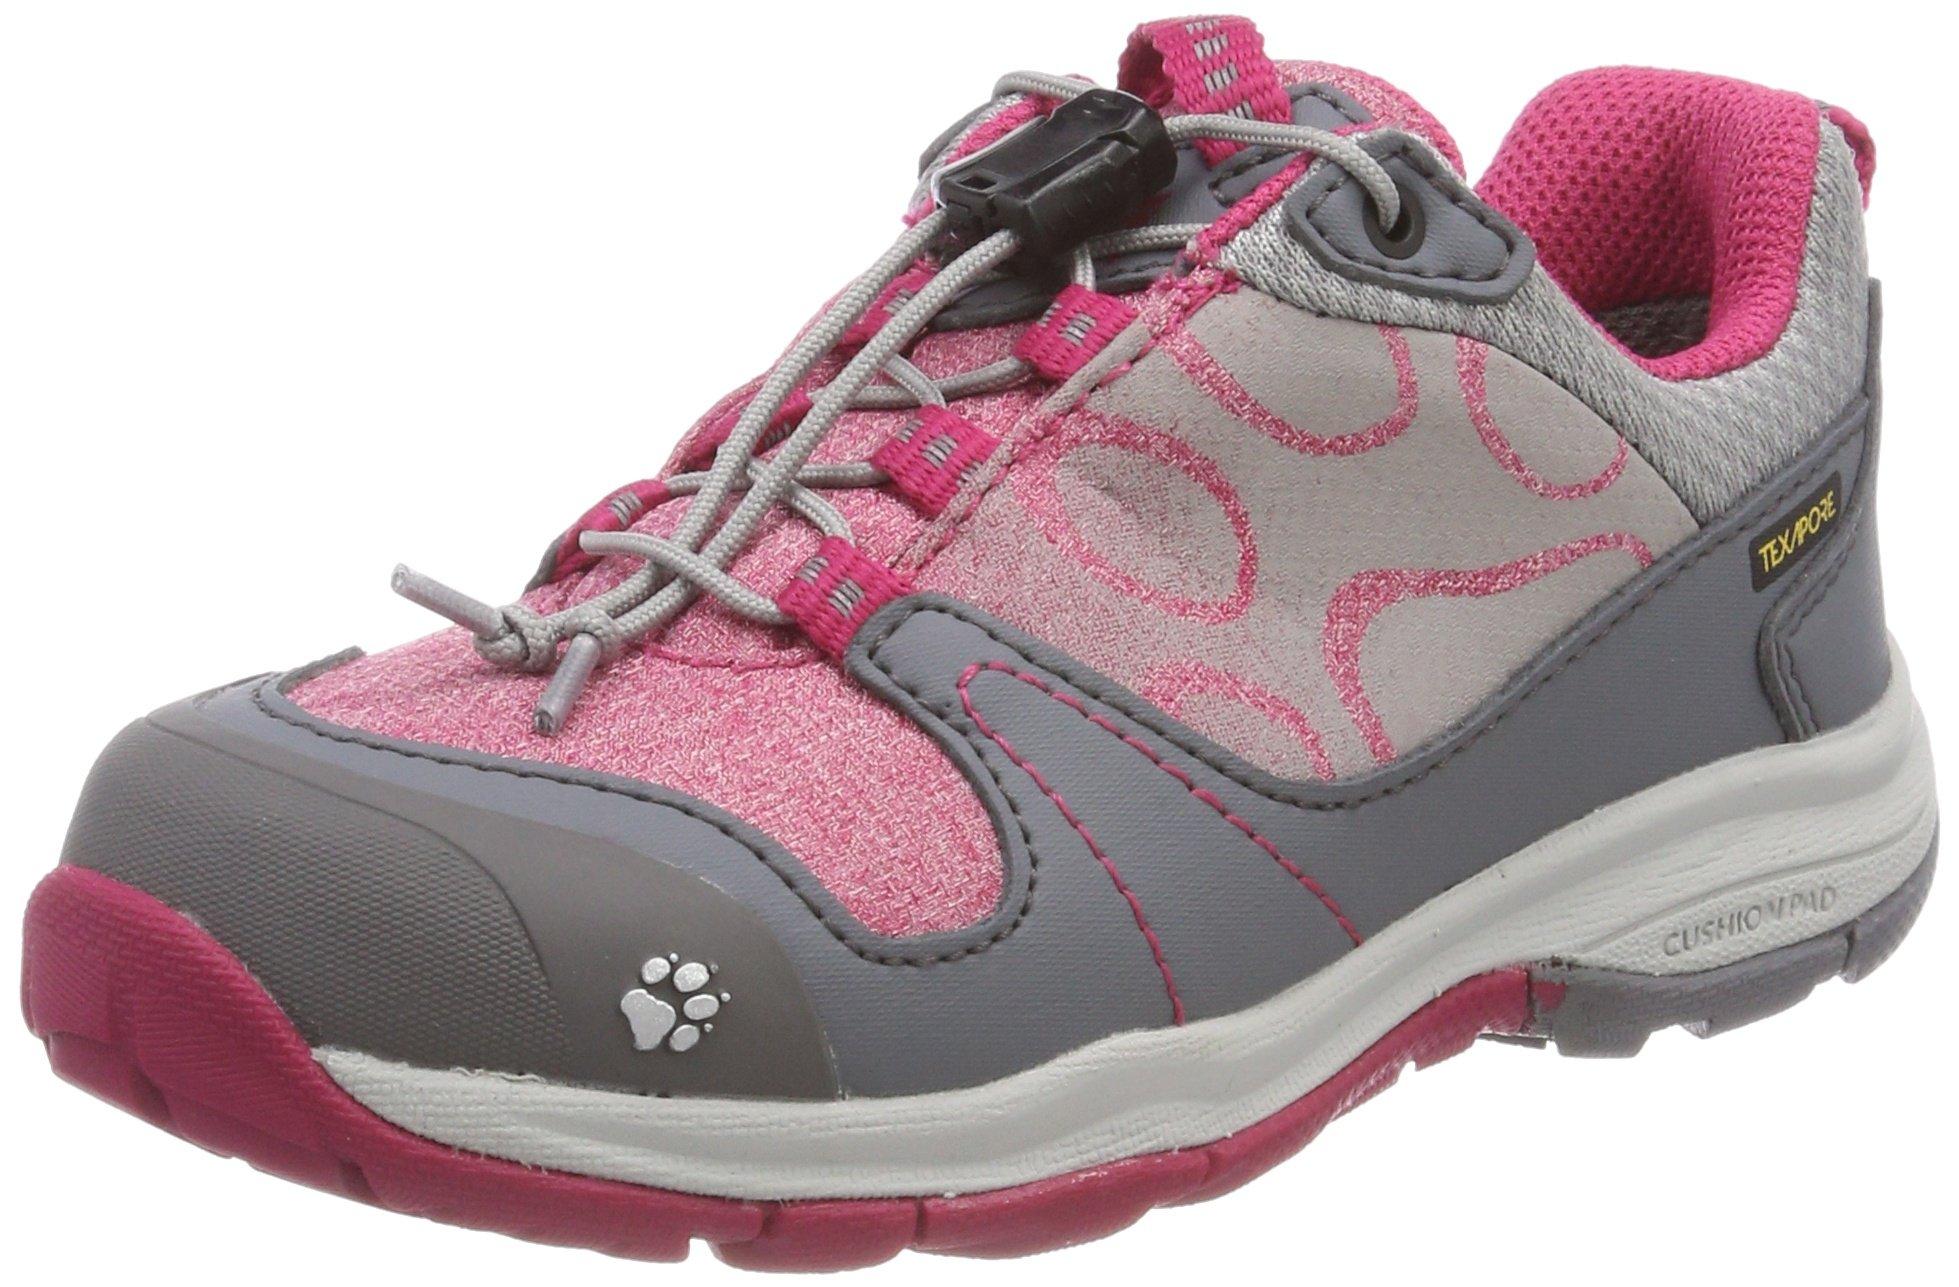 Jack Wolfskin Girls Grivla Texapore Low G Wasserdicht Rise Hiking Shoes 1